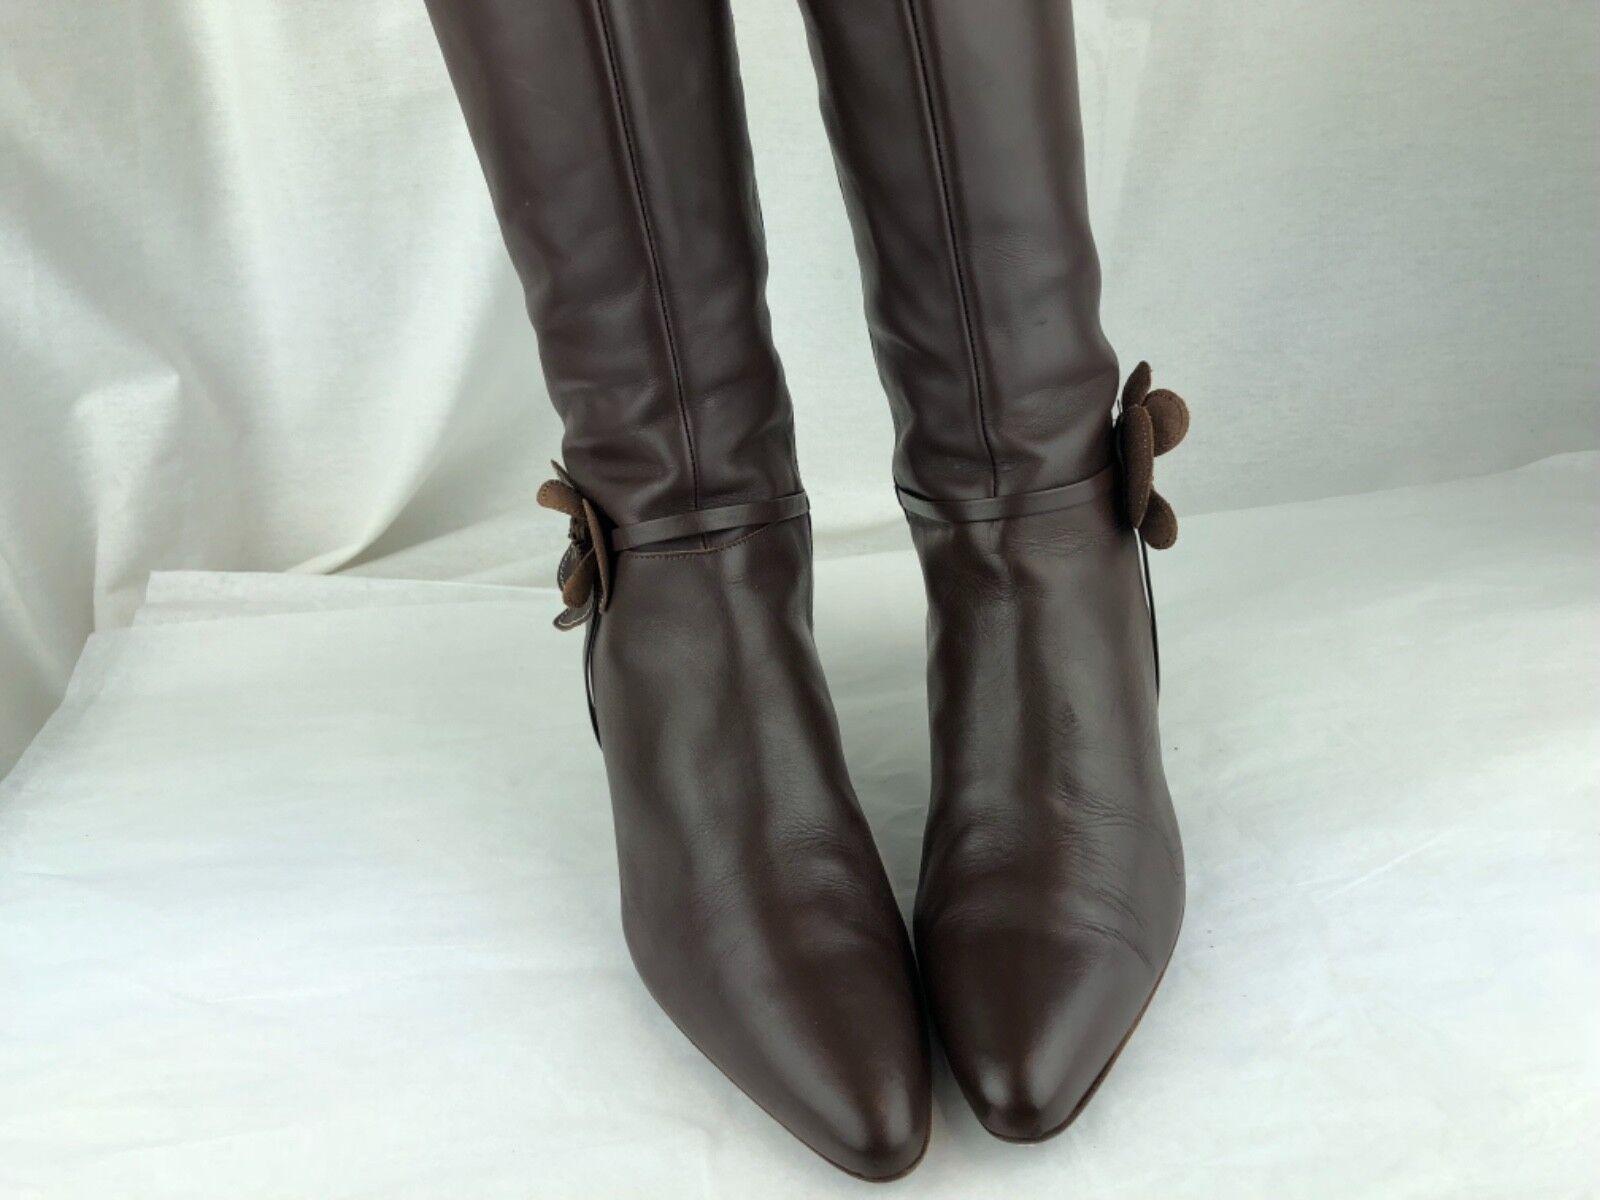 J.Crew J.Crew J.Crew Brown Leather Side Zip Flower Knee Boots Women's Size 8 H Style 57240 dfe691